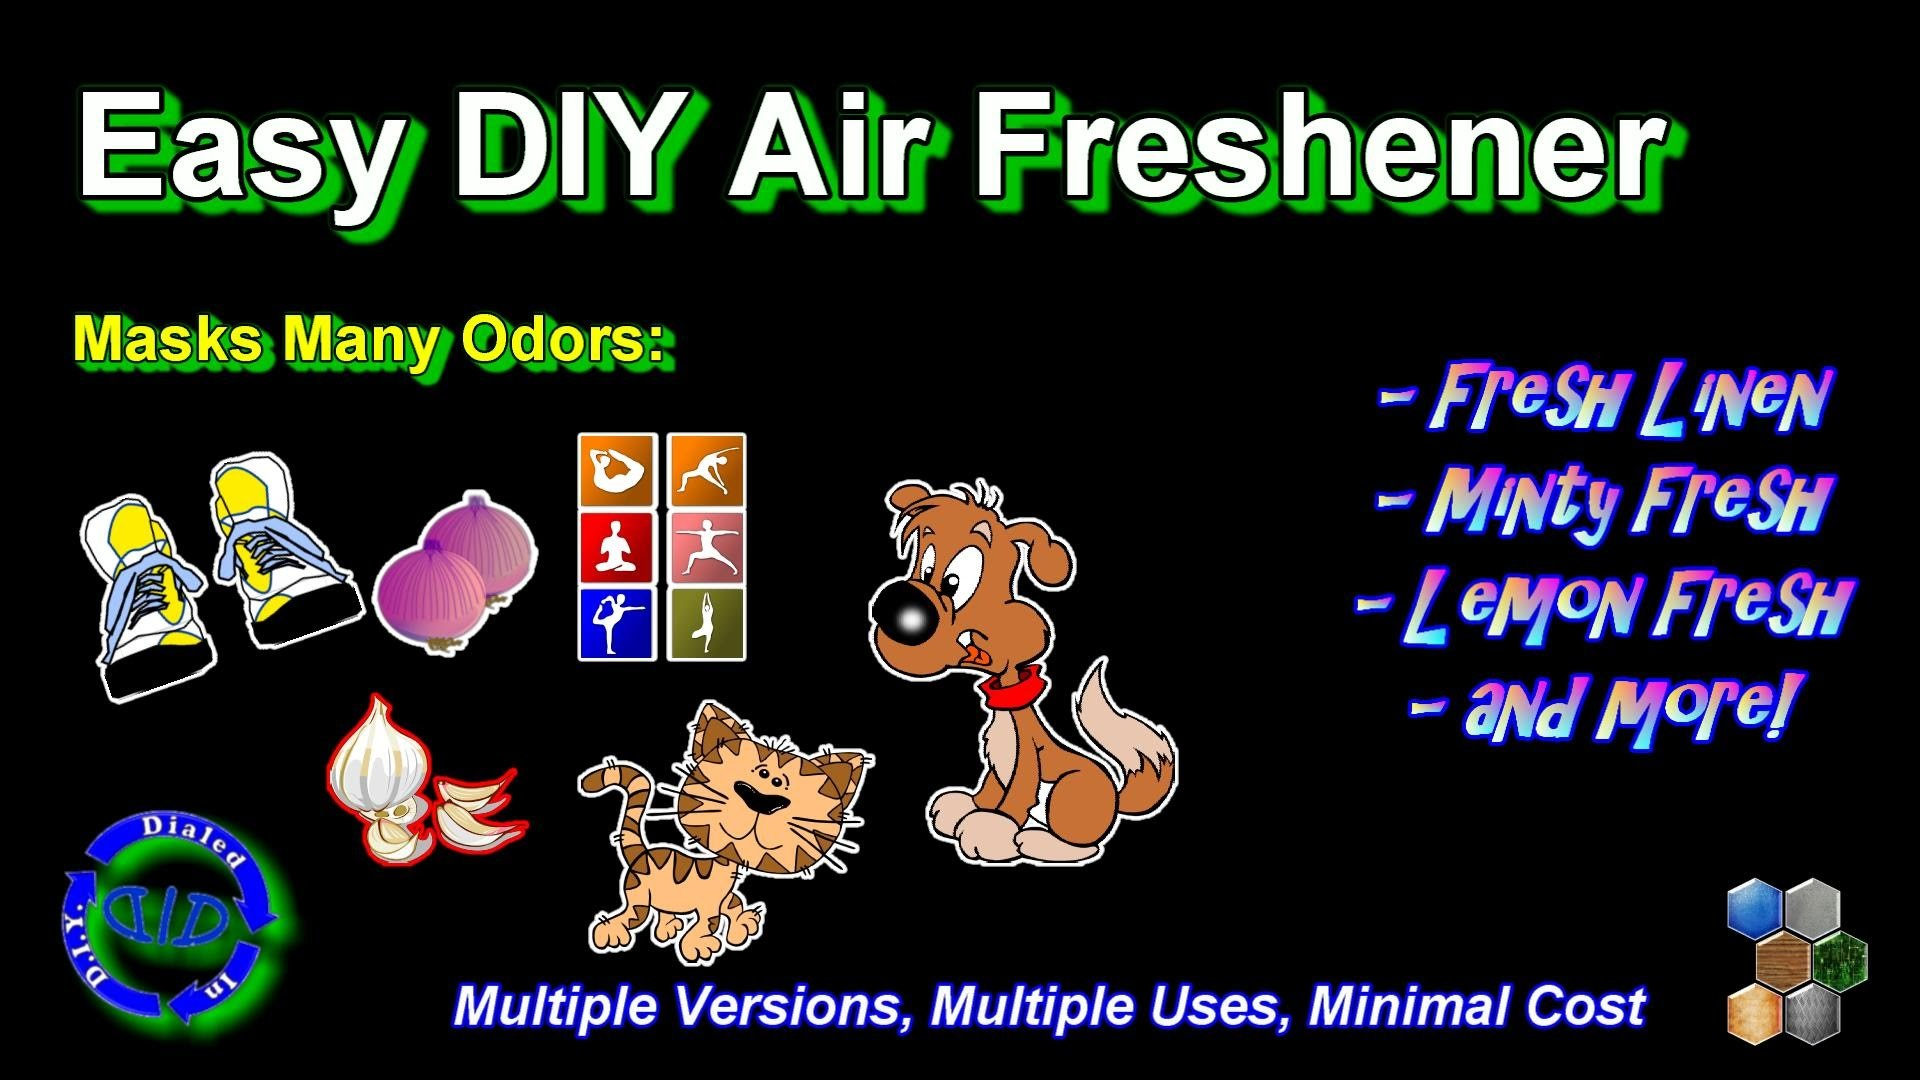 DIY Air Freshener - Room Deodorizer - Fresh Clean Smell Instantly